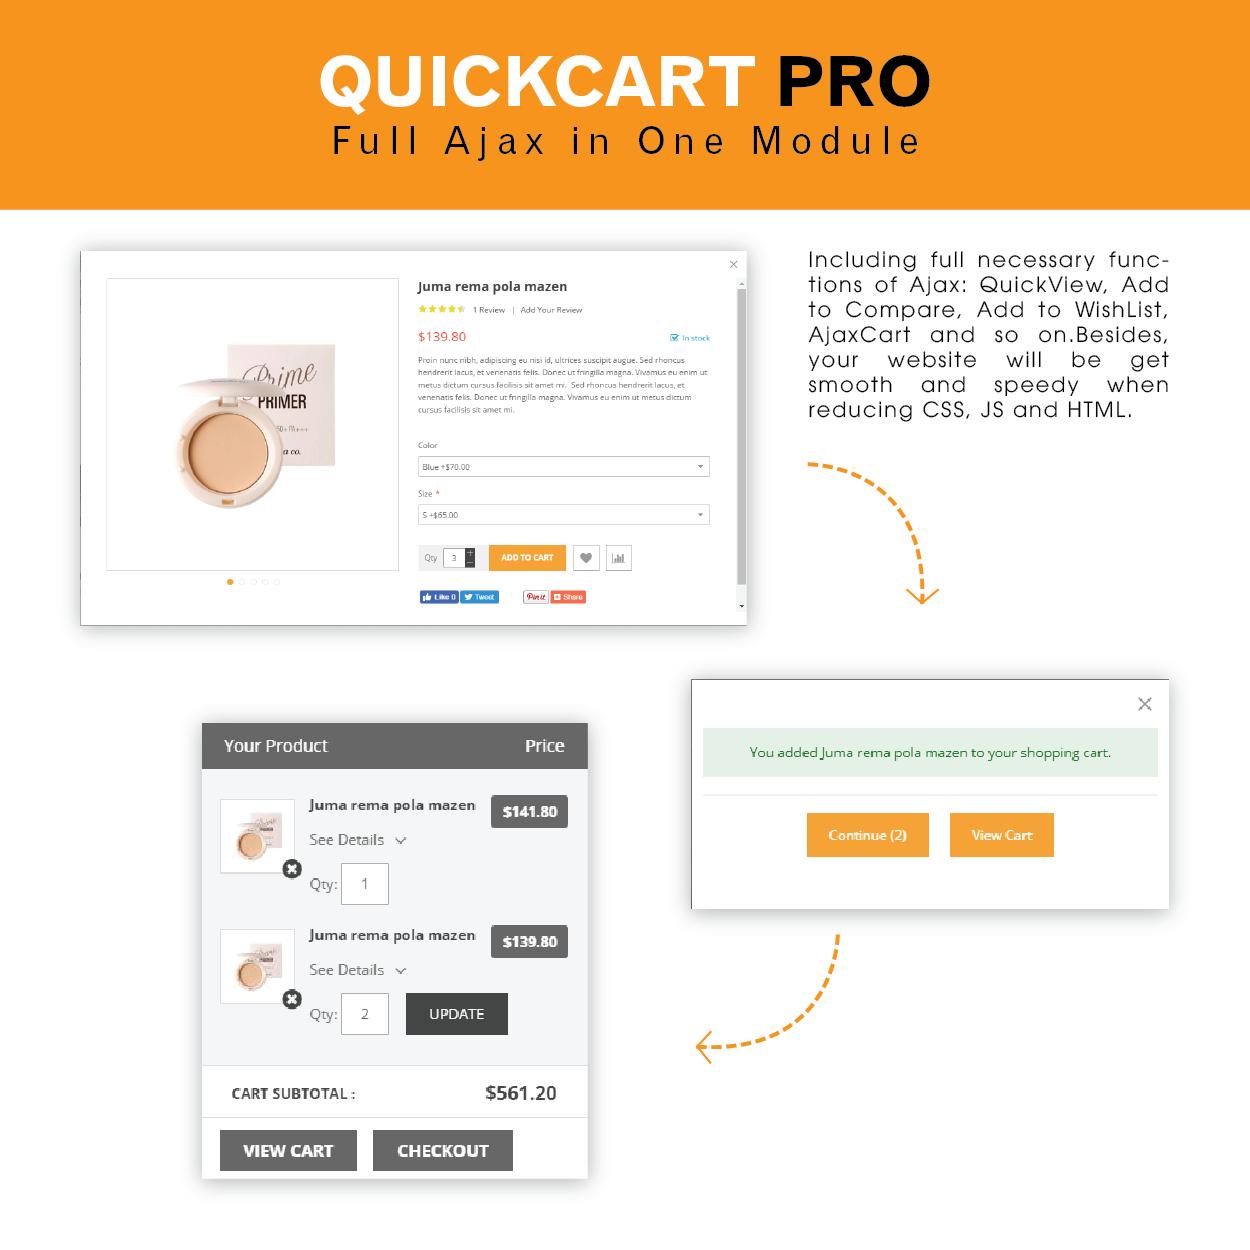 QuickCart Pro